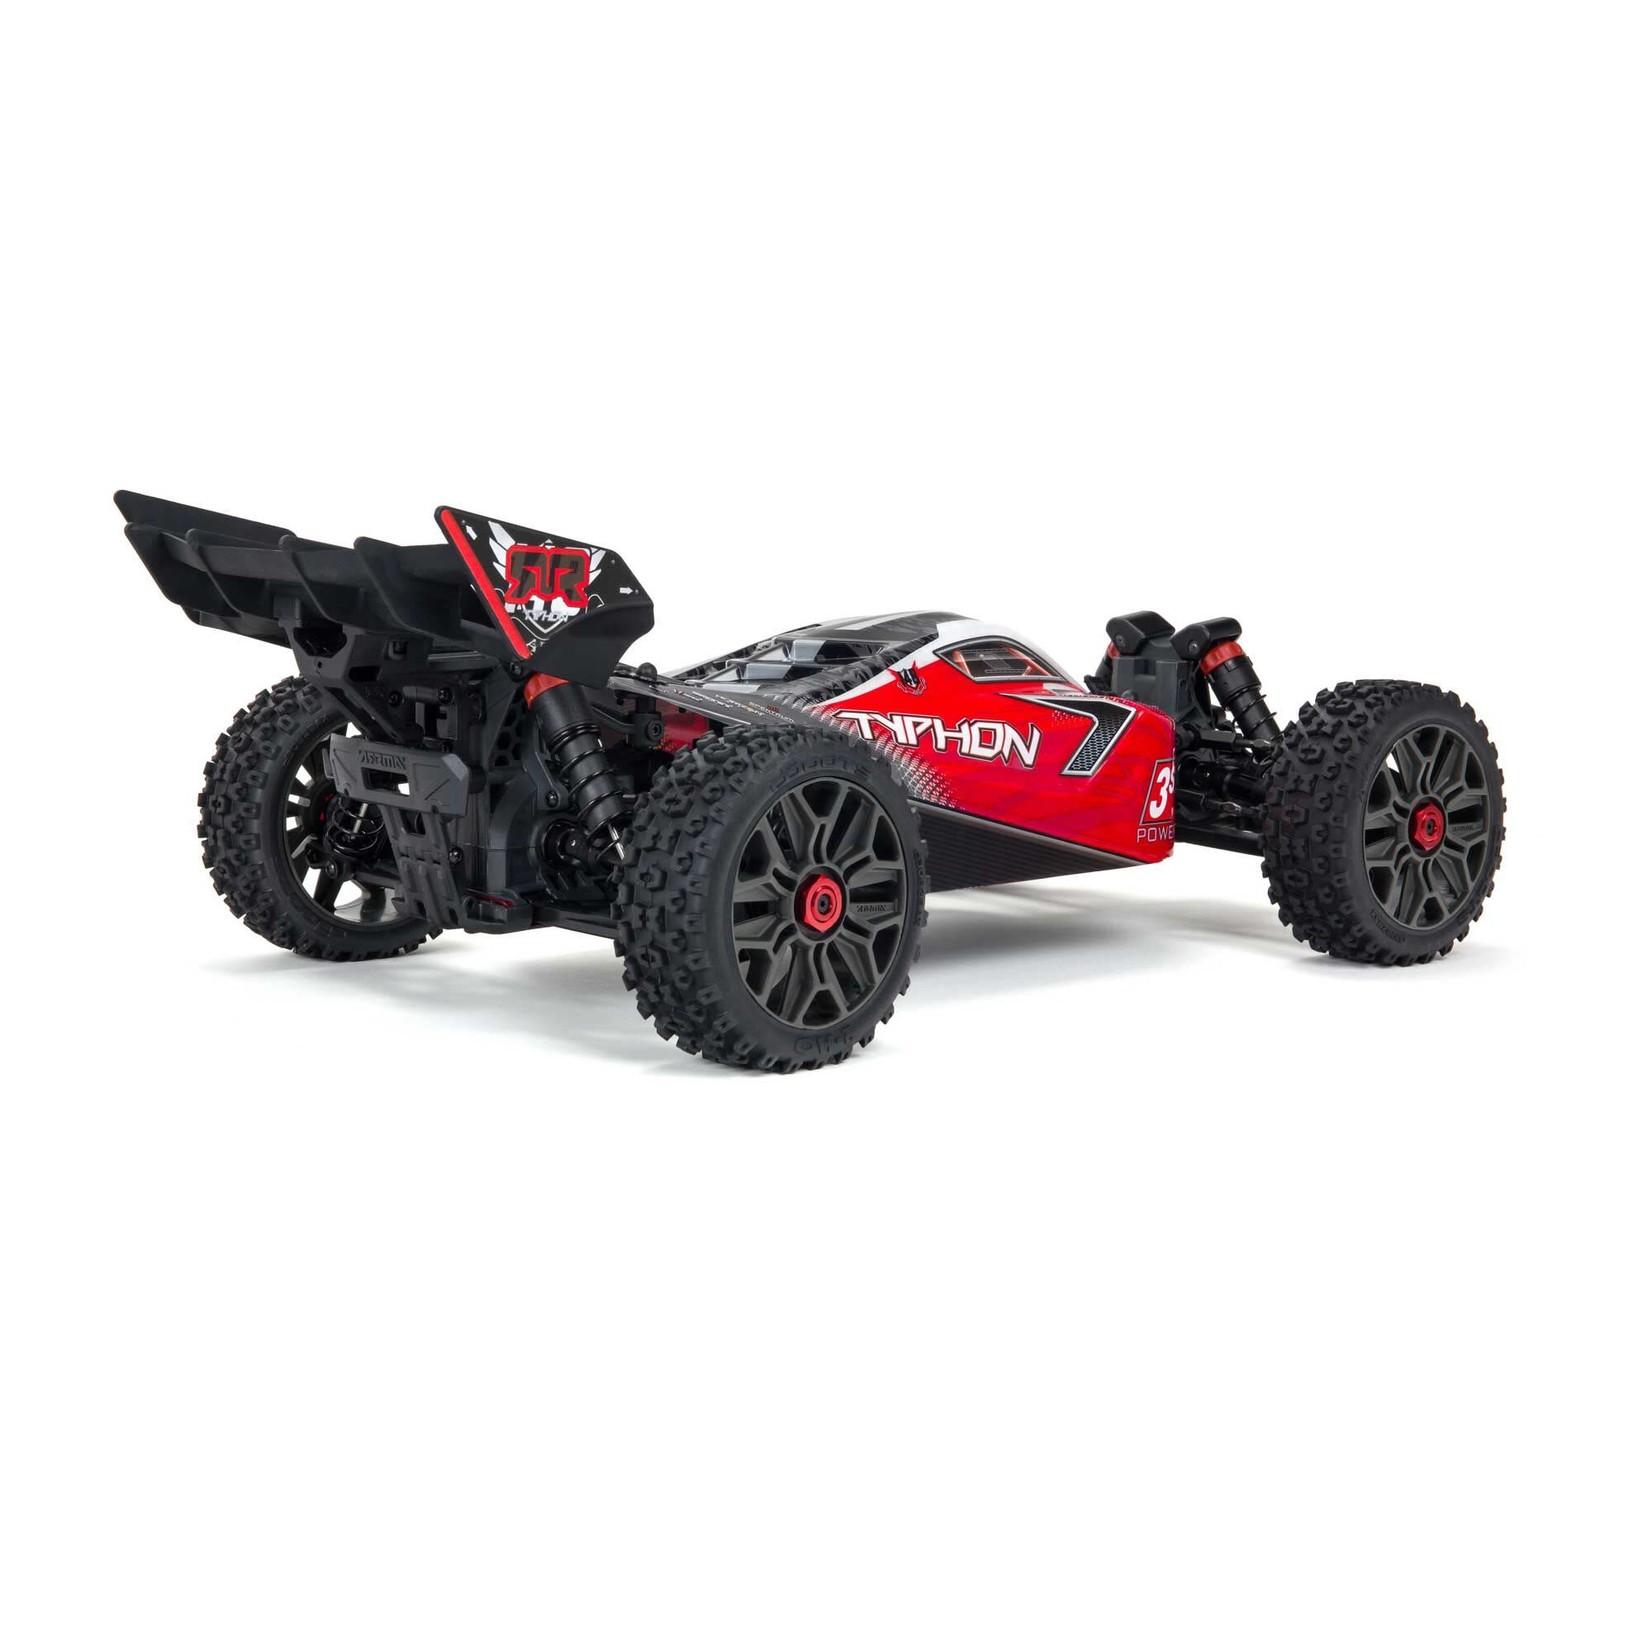 ARRMA ARA4306V3 Arrma Typhon 4X4 3S BLX Brushless 1/8th 4wd Buggy Red